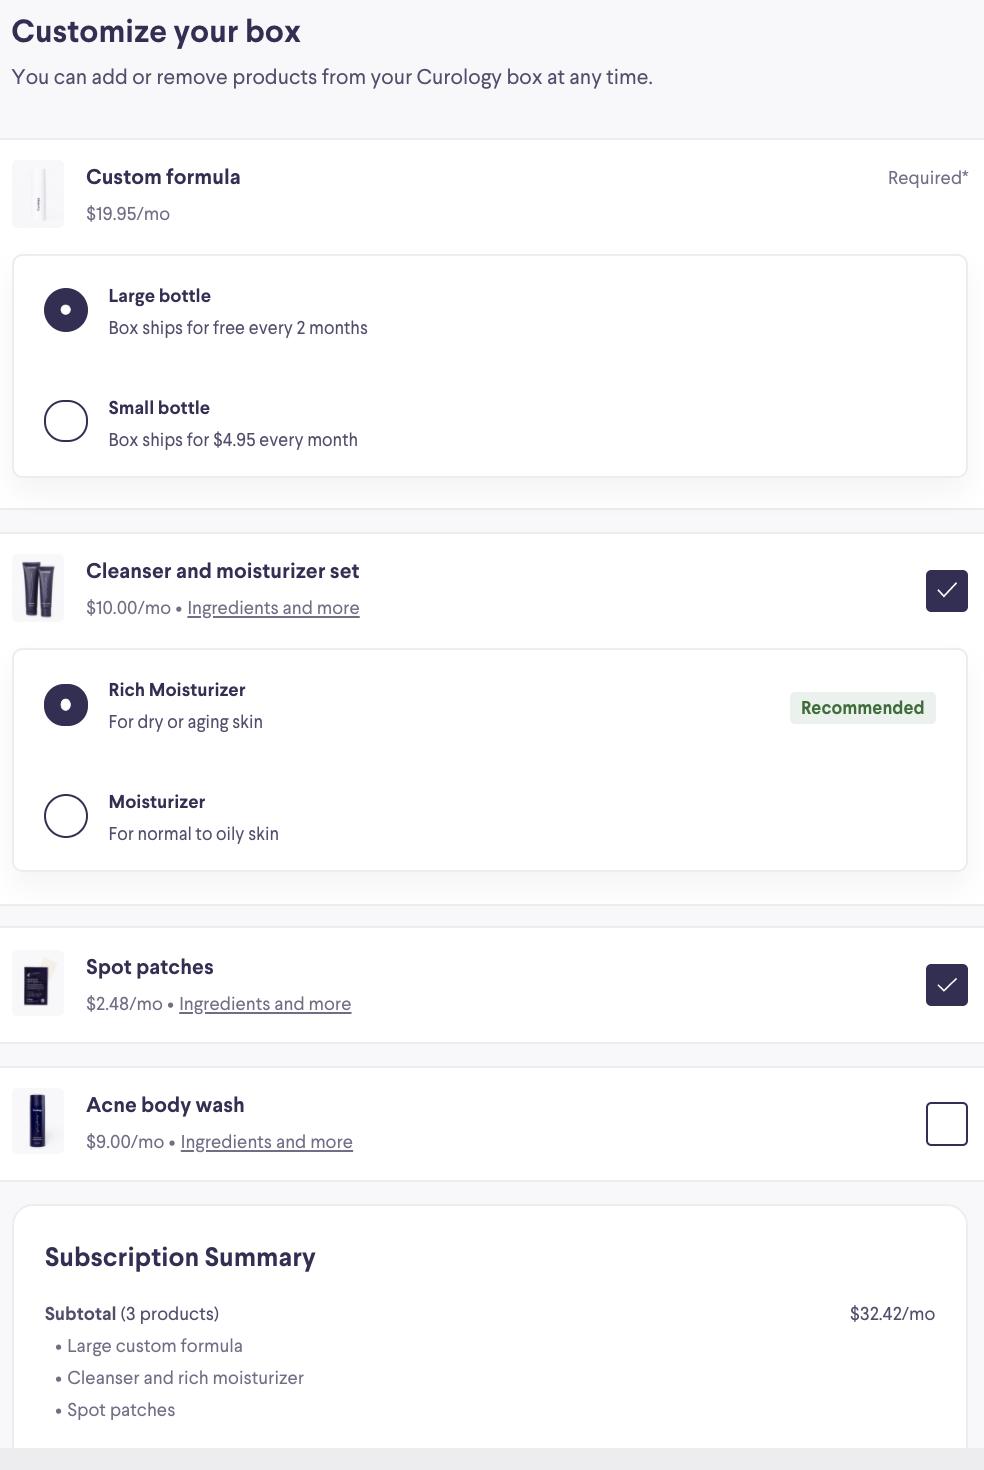 Curology's subscription management platform.